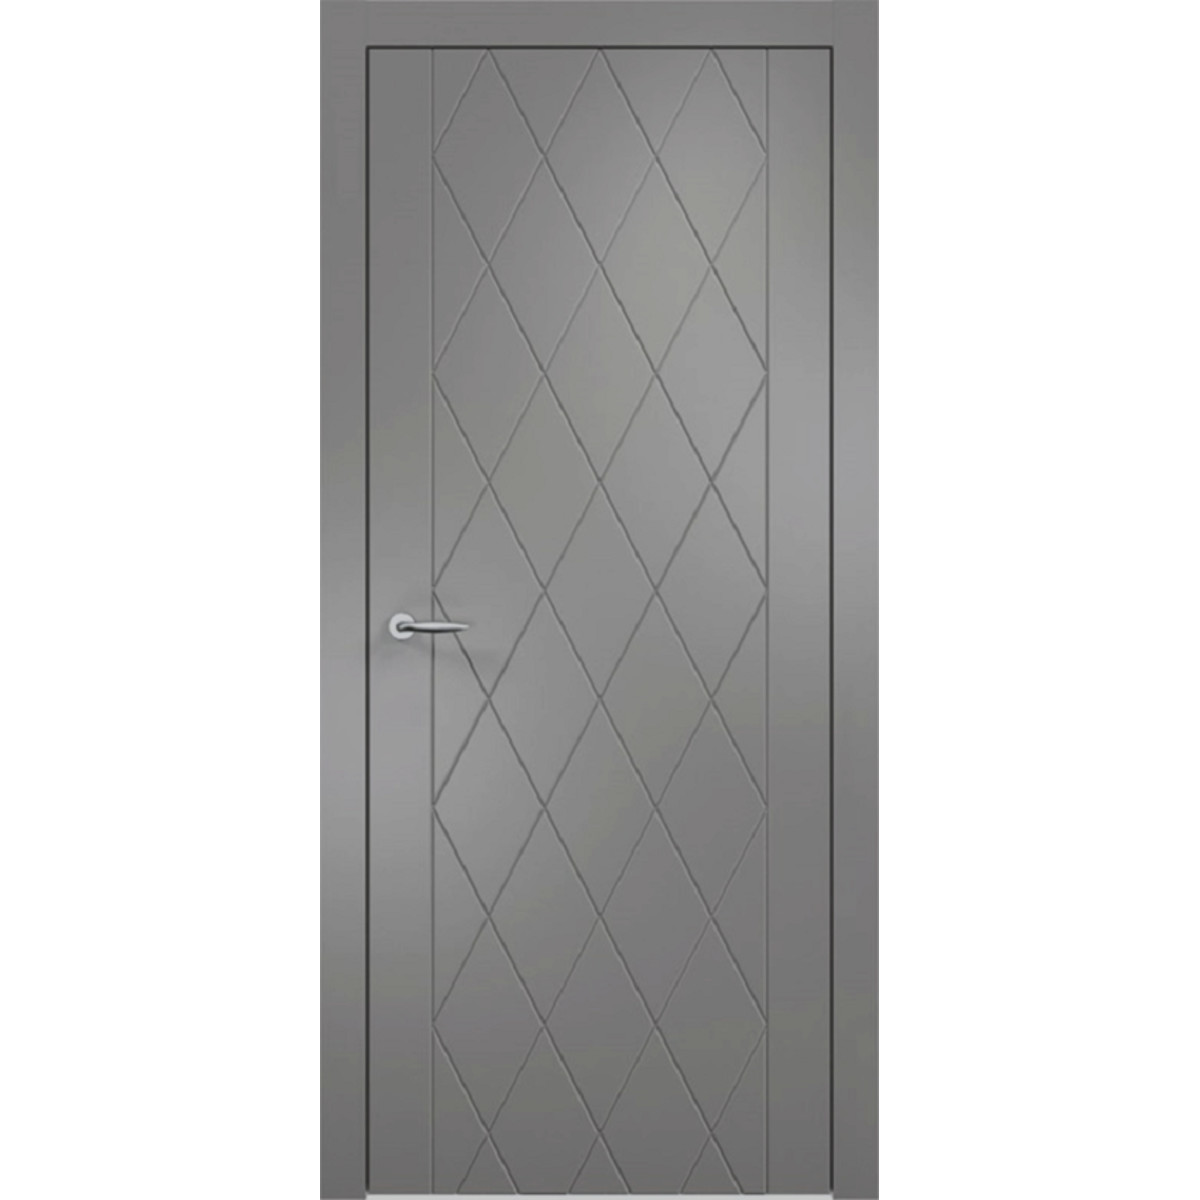 Дверное полотно Loyard Севилья МП_0398 2000х800х44 мм МДФ